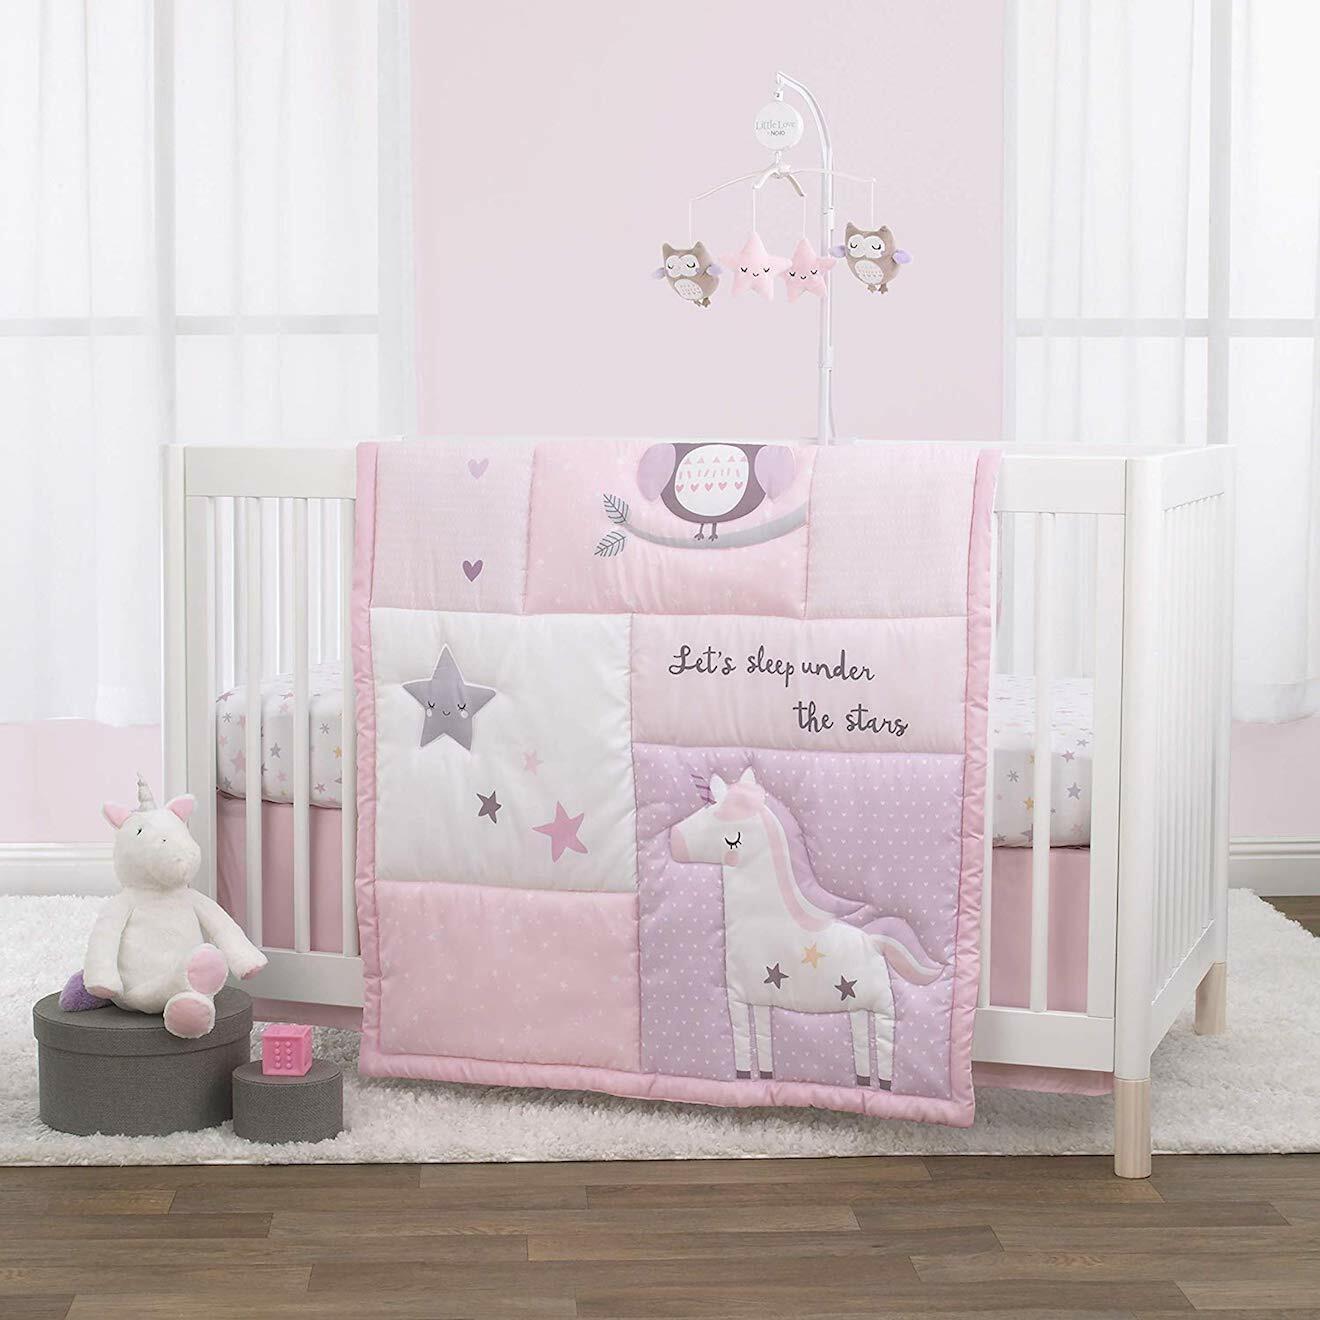 Shine On My Love 4 Pc. Crib Bedding Set By NoJo - $84.99